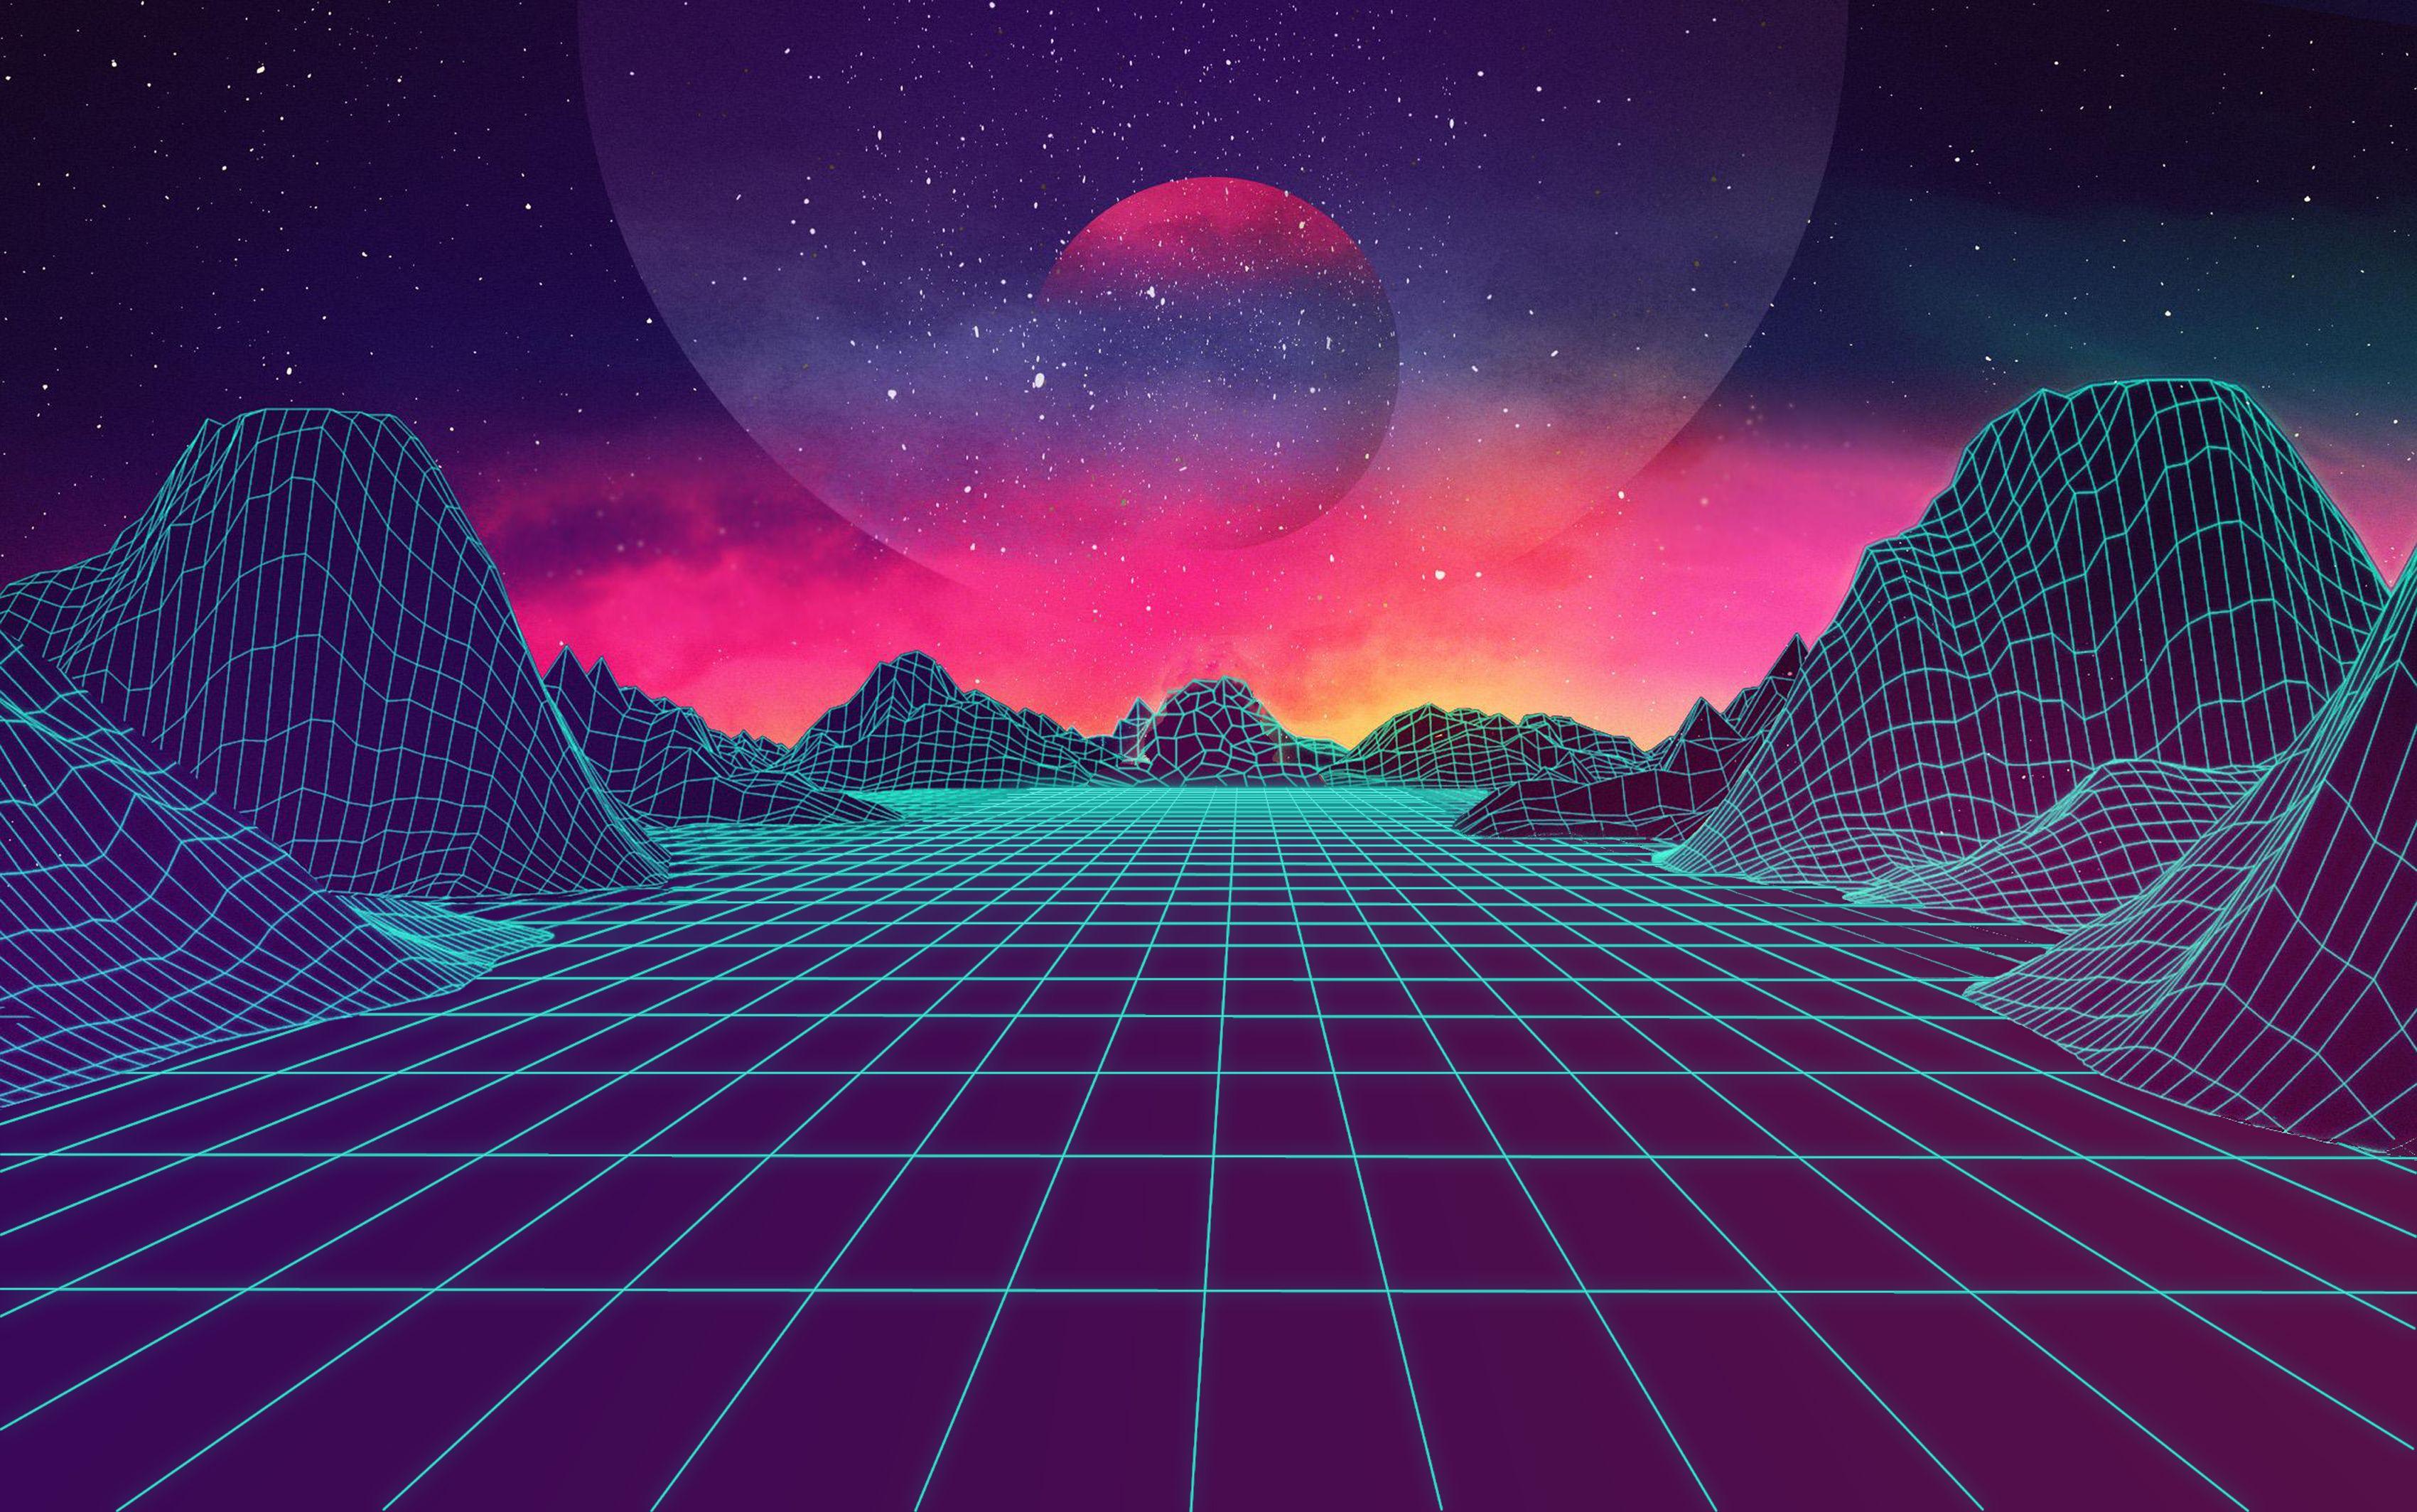 Digital Landscape wallpaper Ретро футуризм, Обои для